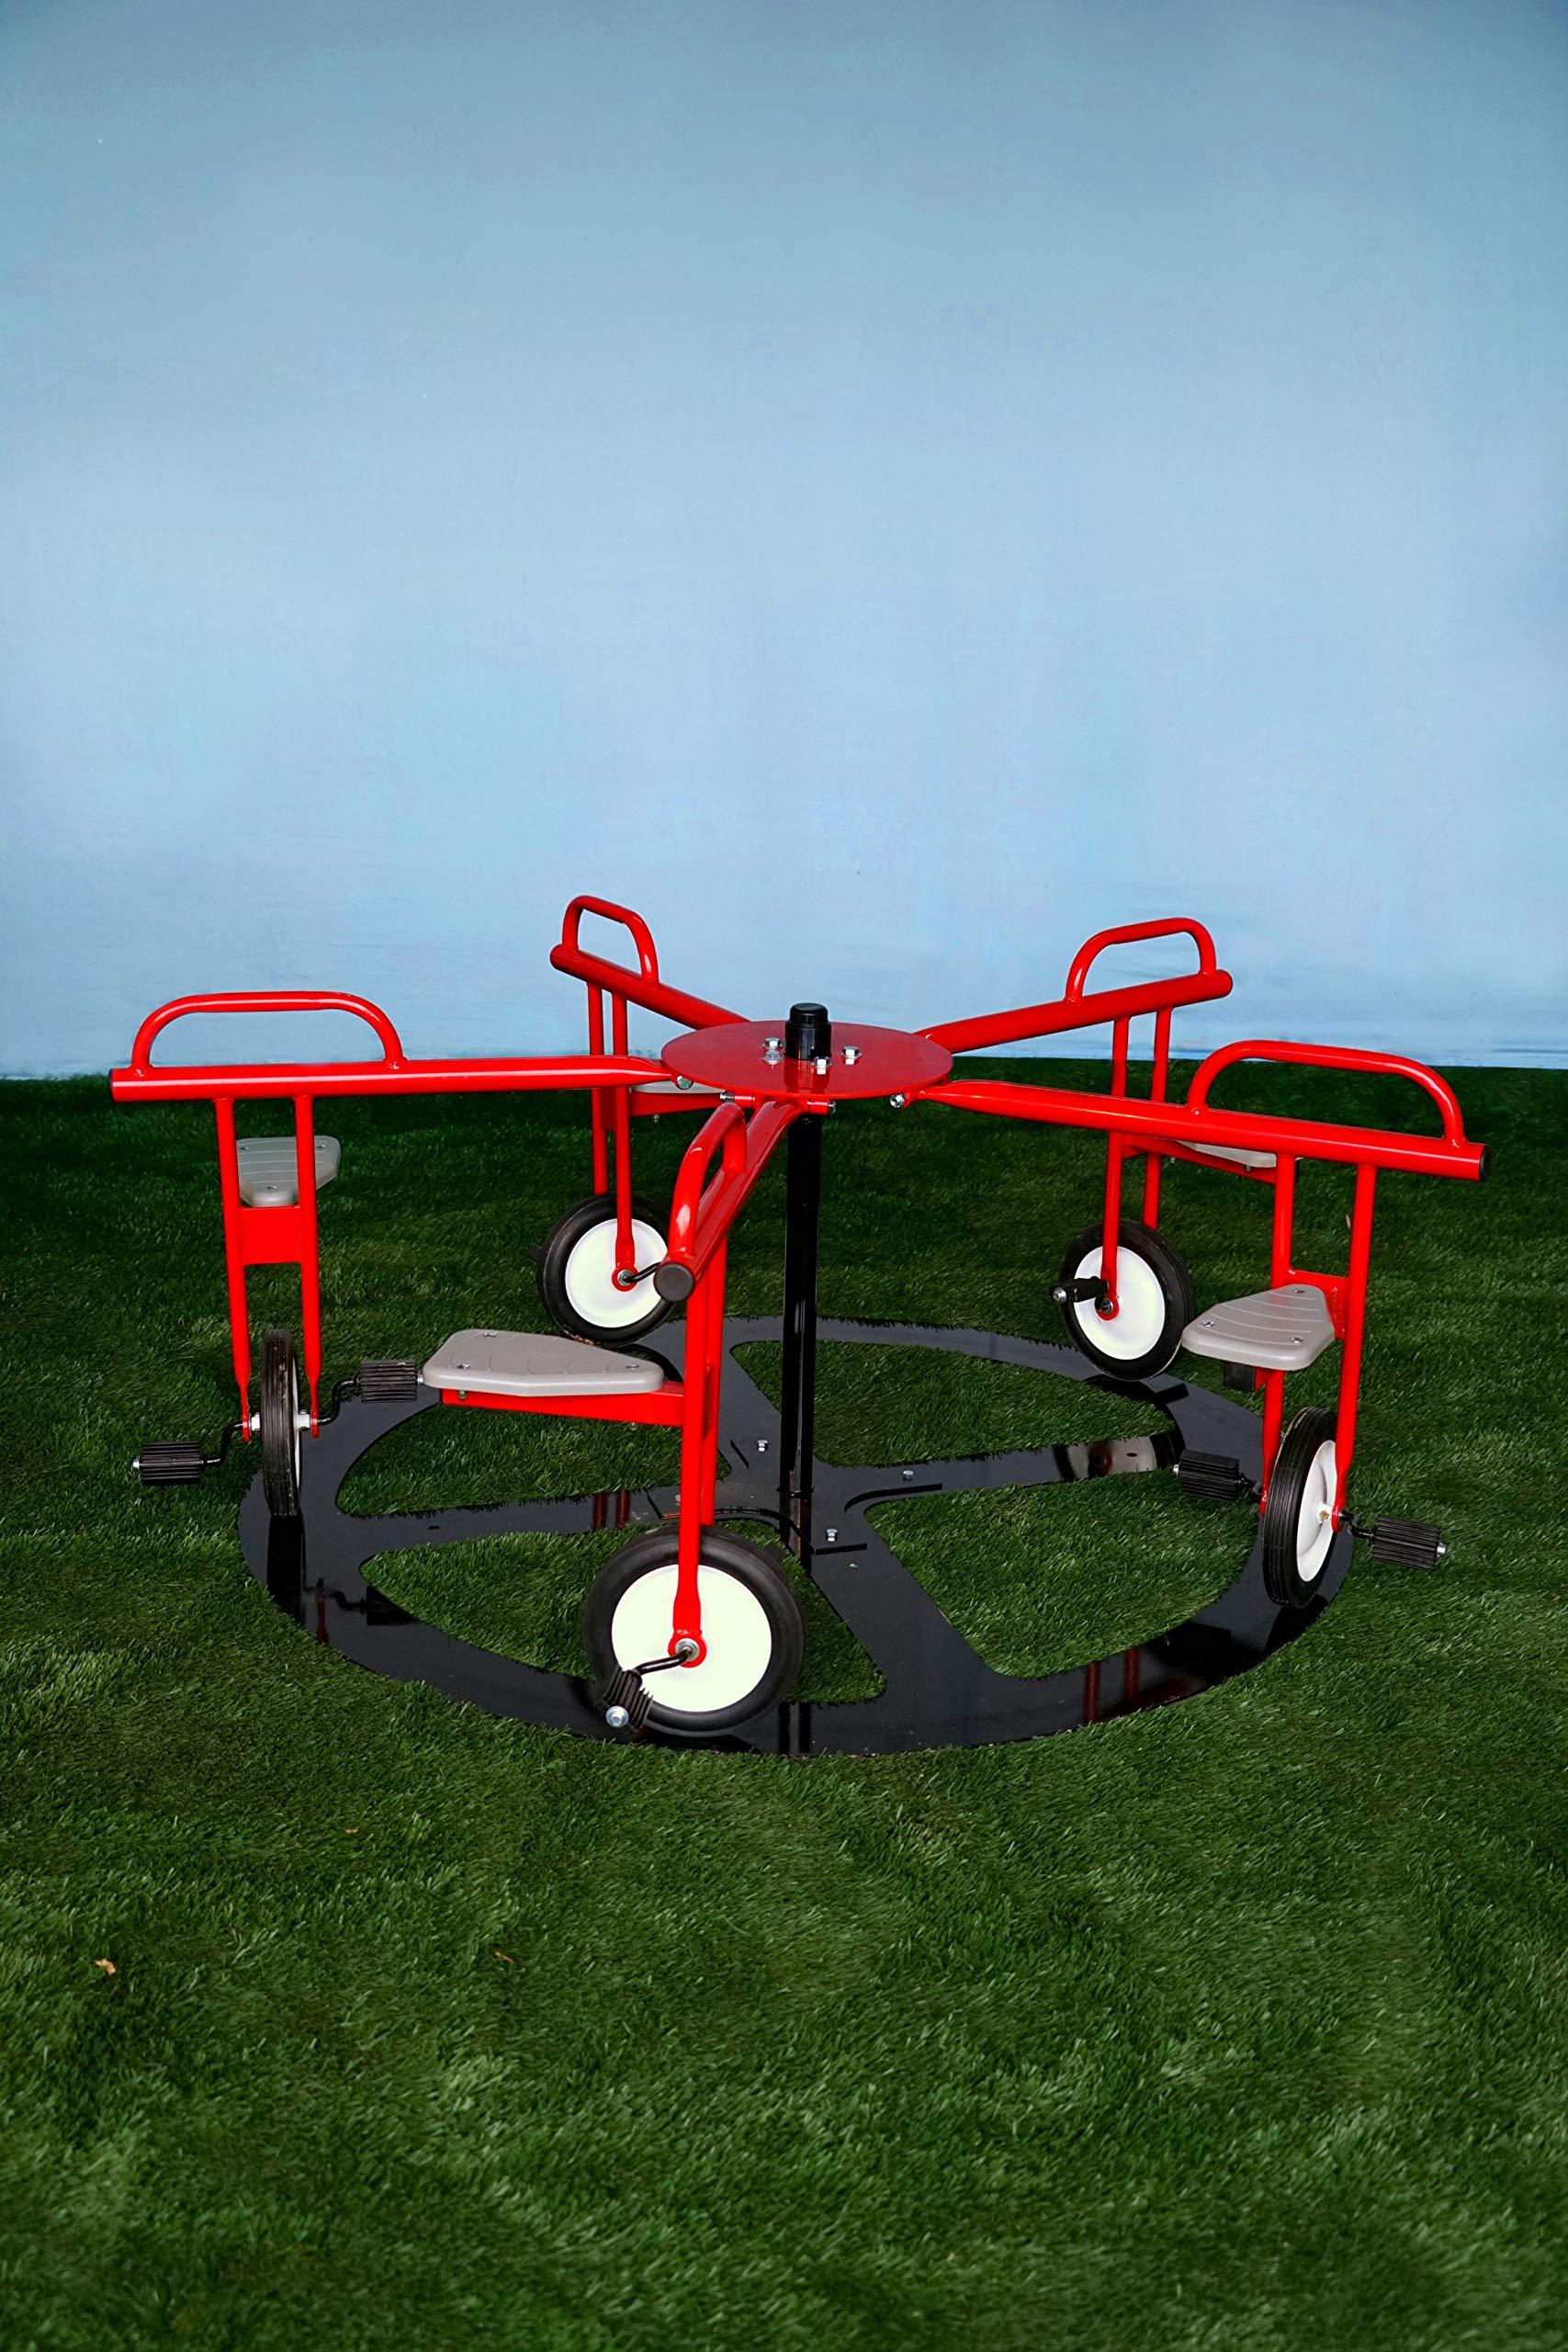 Playtime Playground Equipment Merry Go Cycle Replacement Wheel by Playtime Playground Equipment